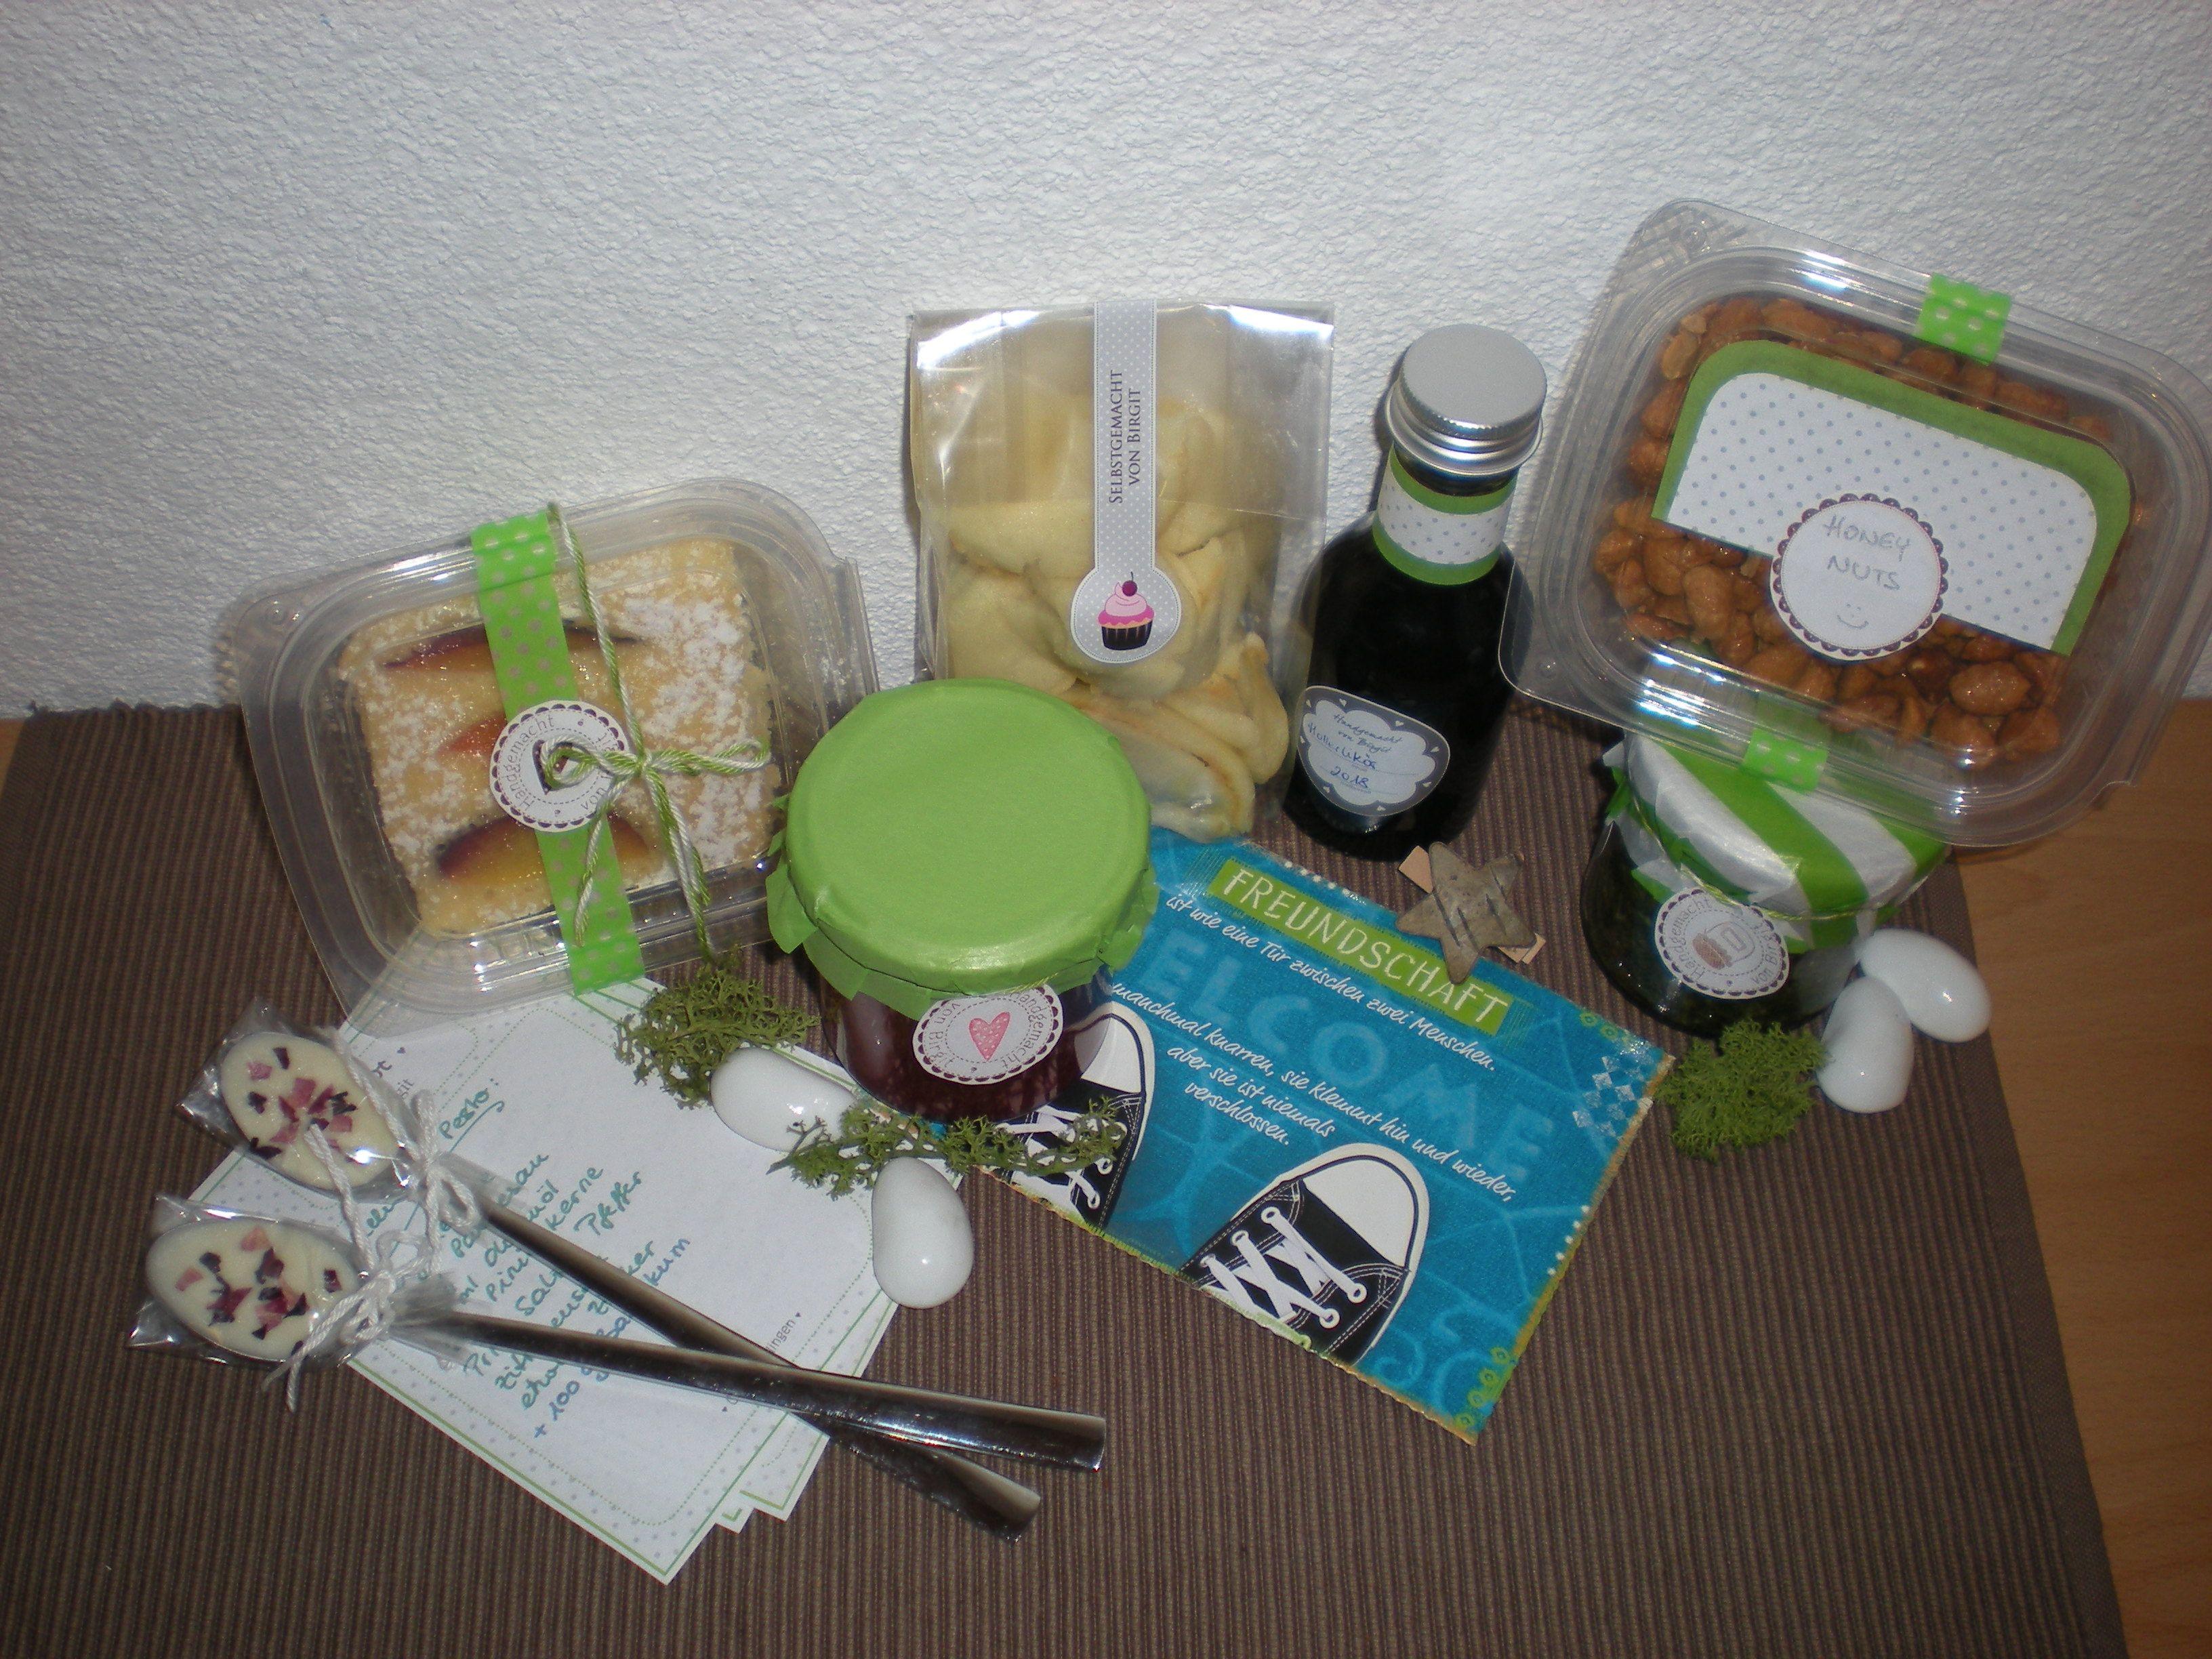 - Obstflex  - White-Rose-Goodie  - Glückskekse  - Erdbeer-Aperol-Marmelade  - Holler-Likör  - Honey-Nuts  - Melissen-Basilikum-Pesto